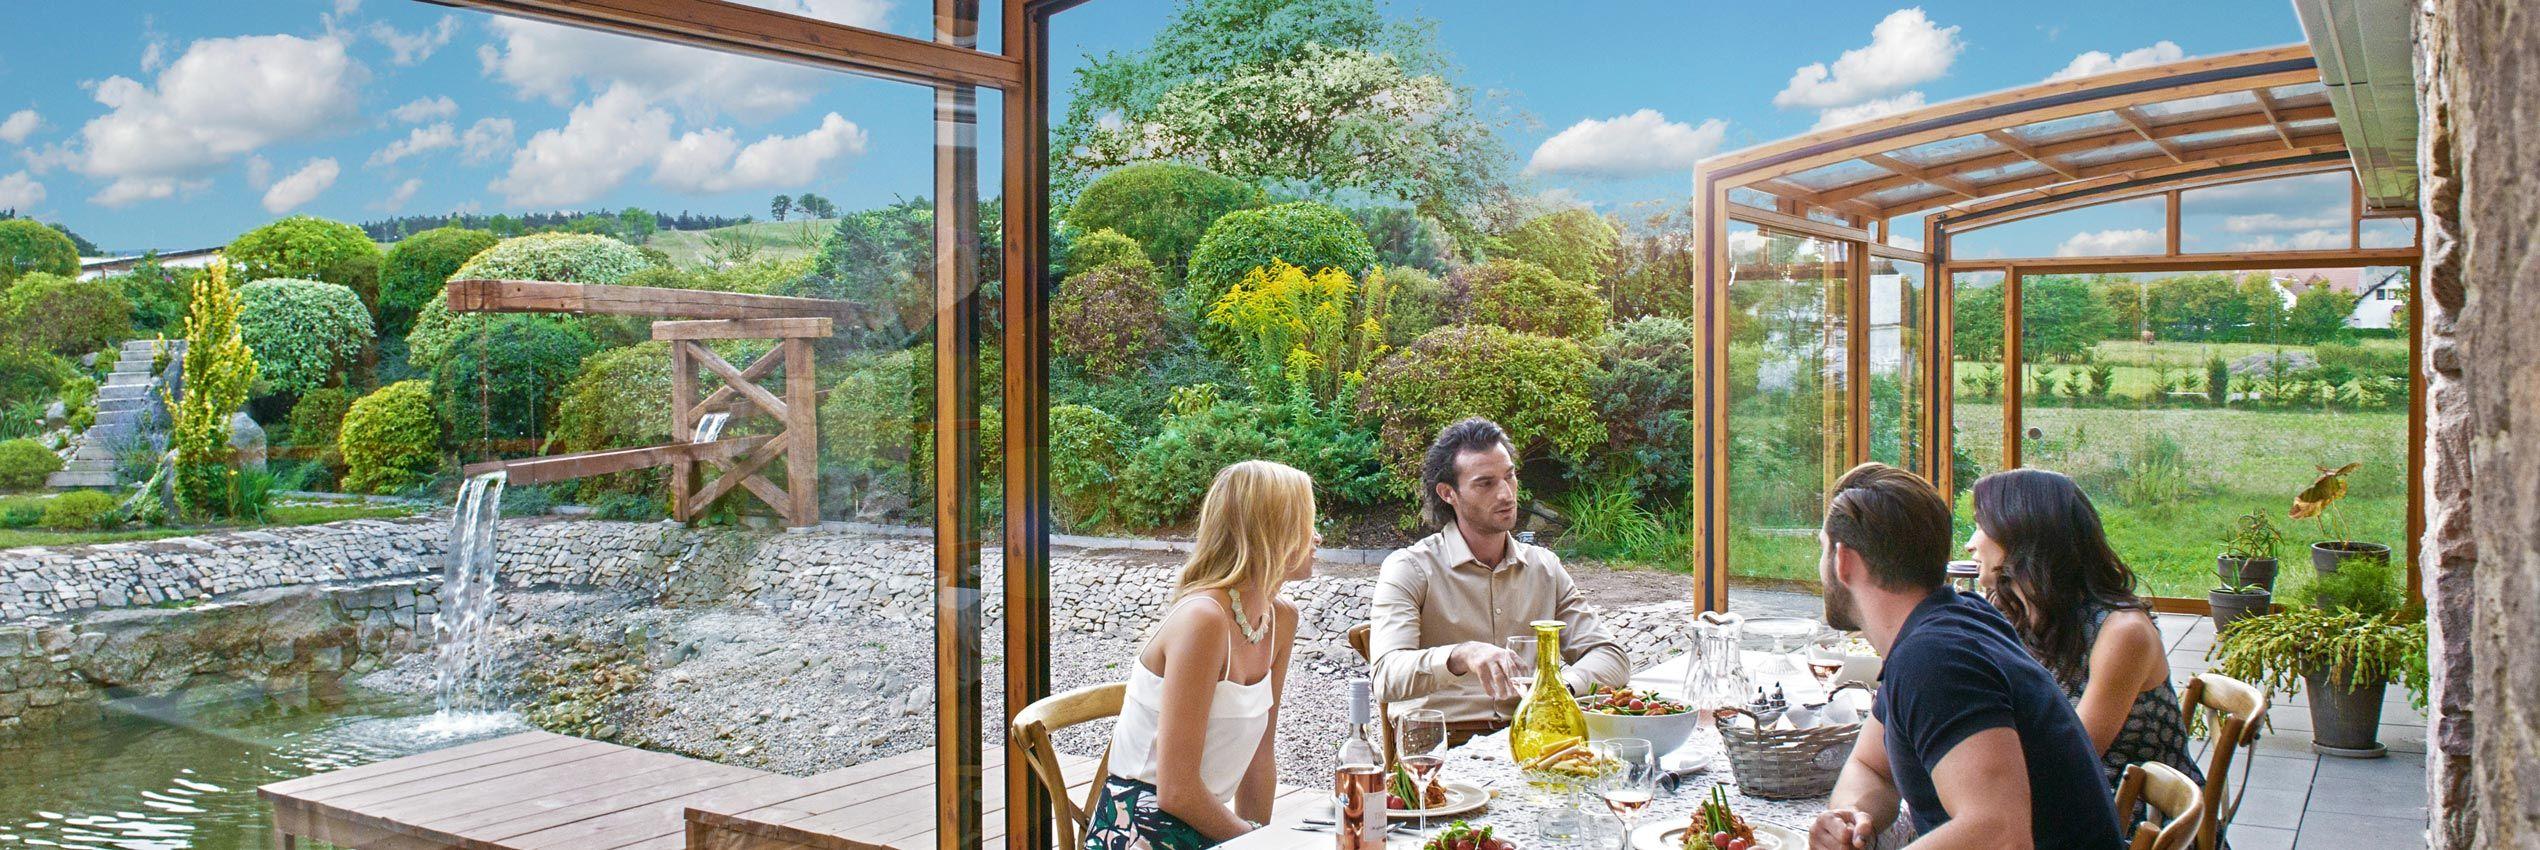 Aufgeschobene Terrassenüberdachung CORSO Premium